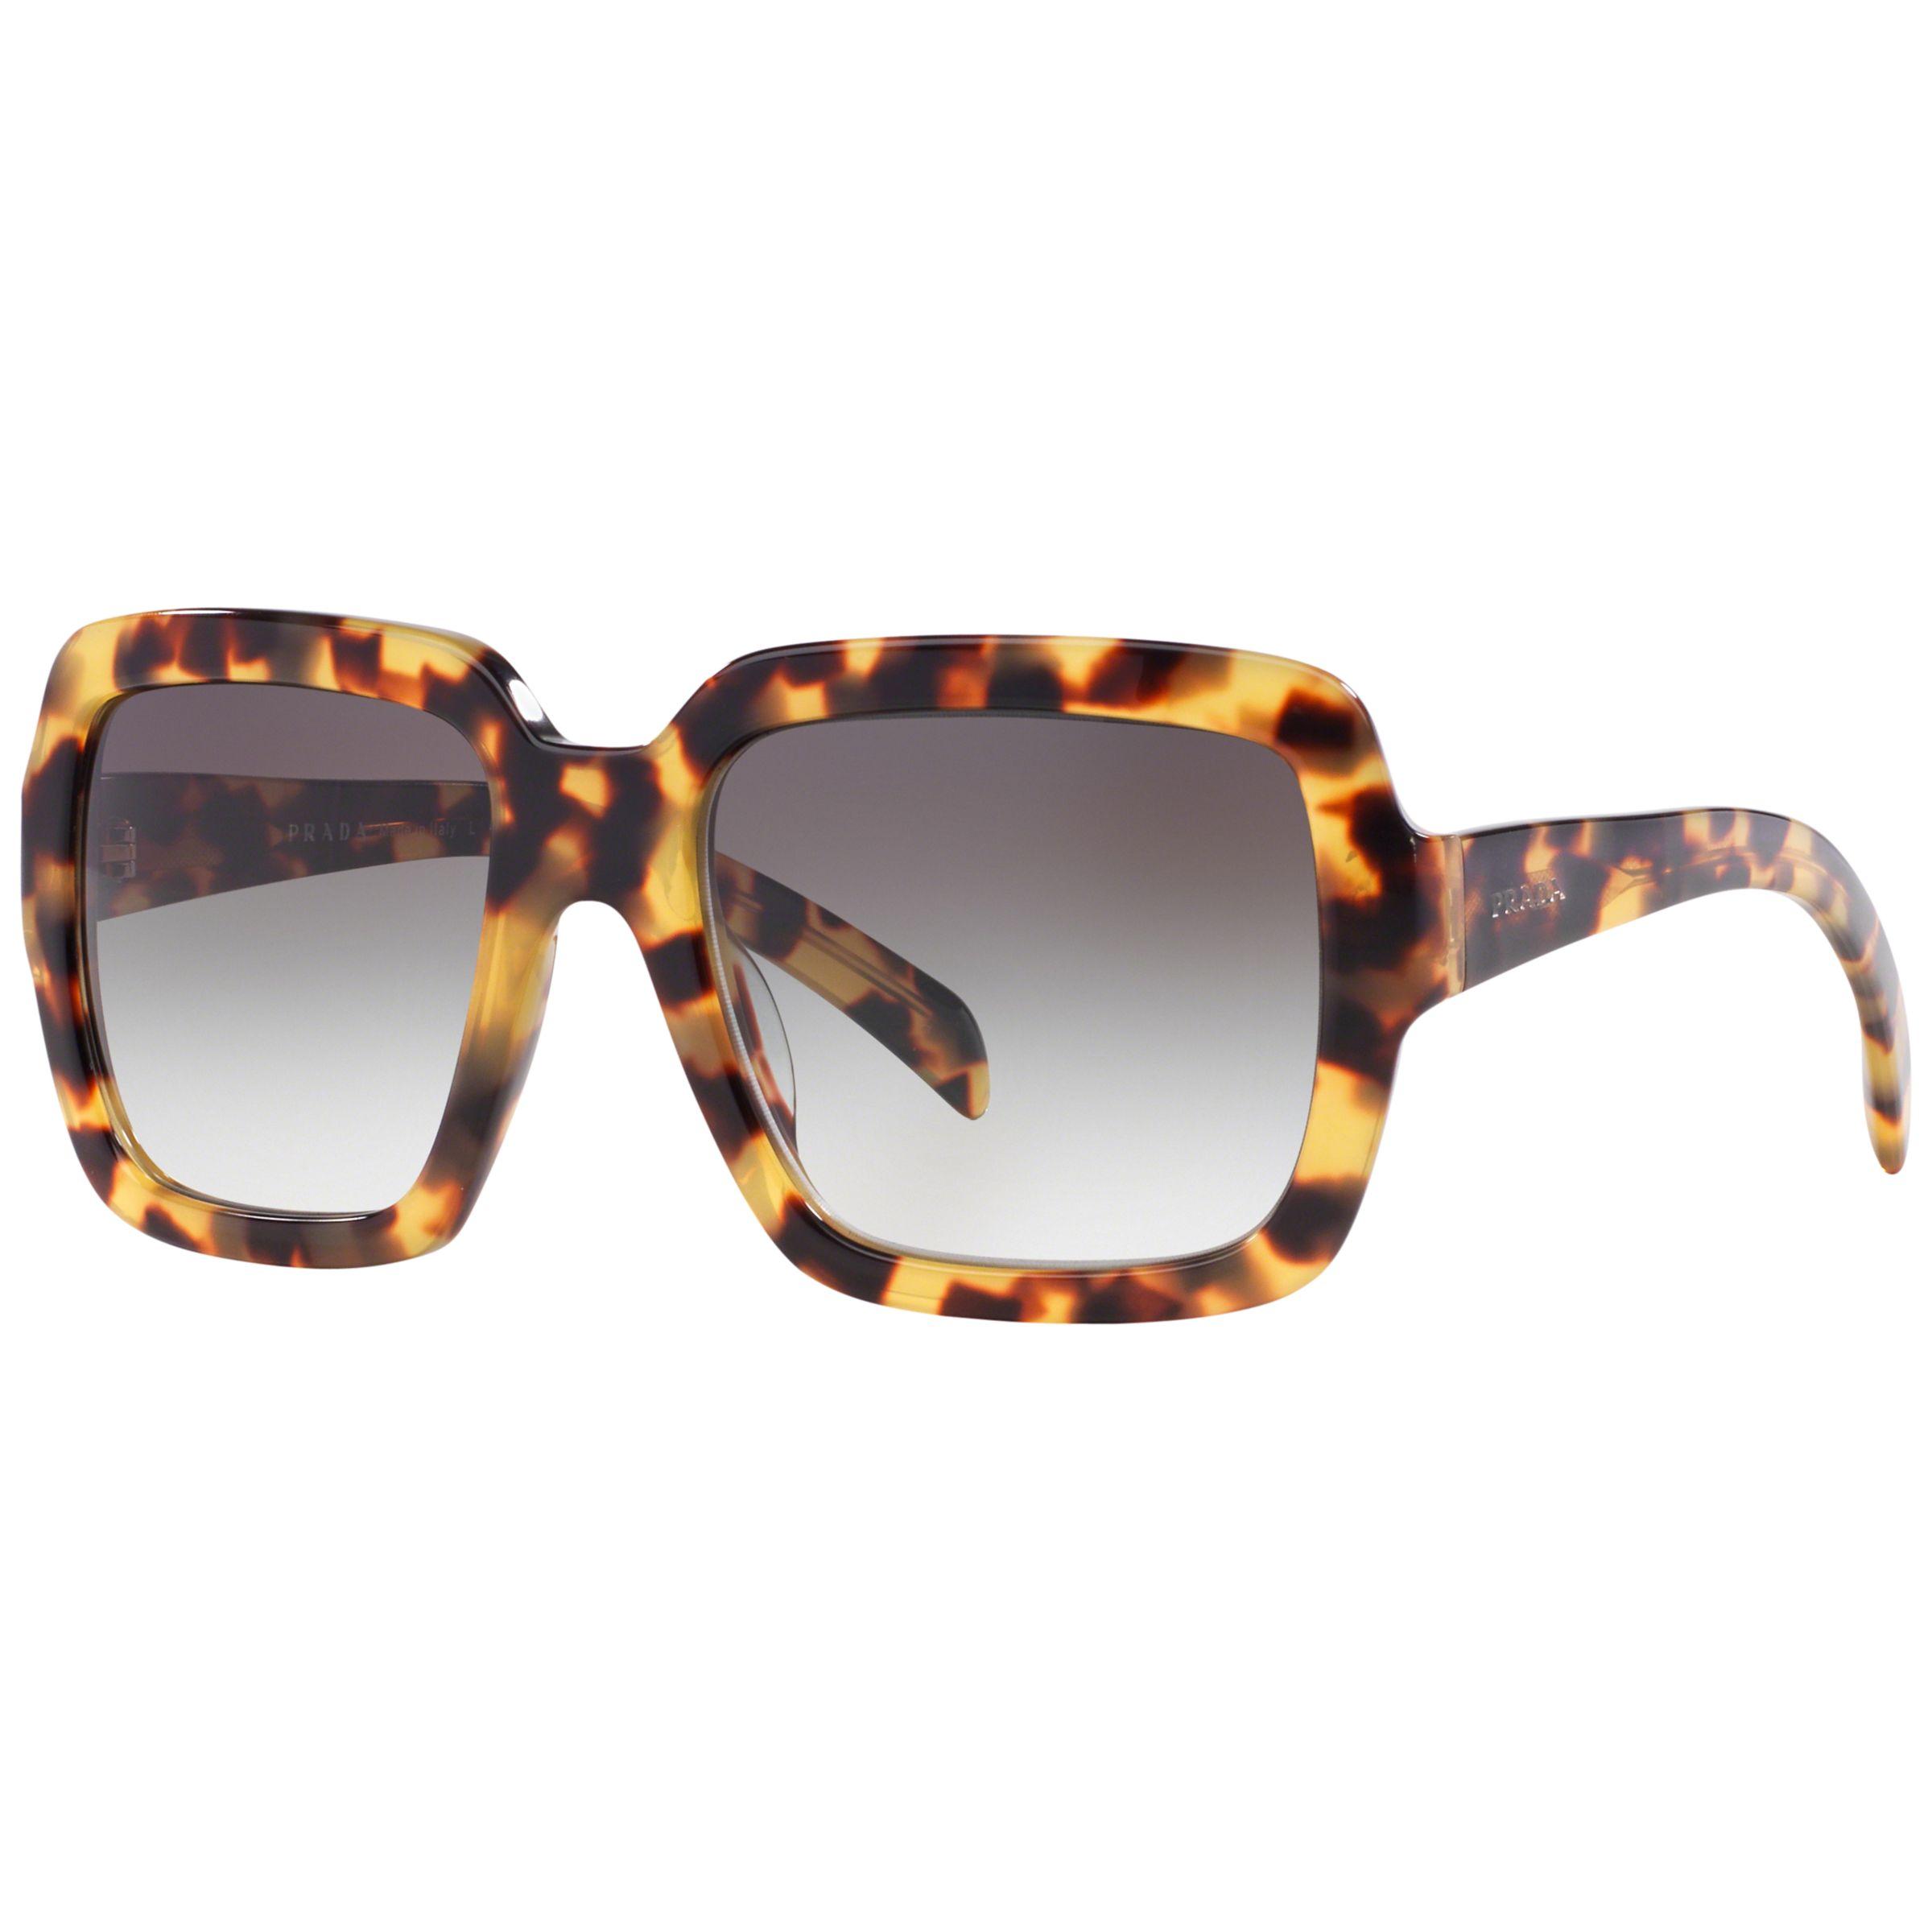 396ed4f4ec Prada PR07RS Square Sunglasses